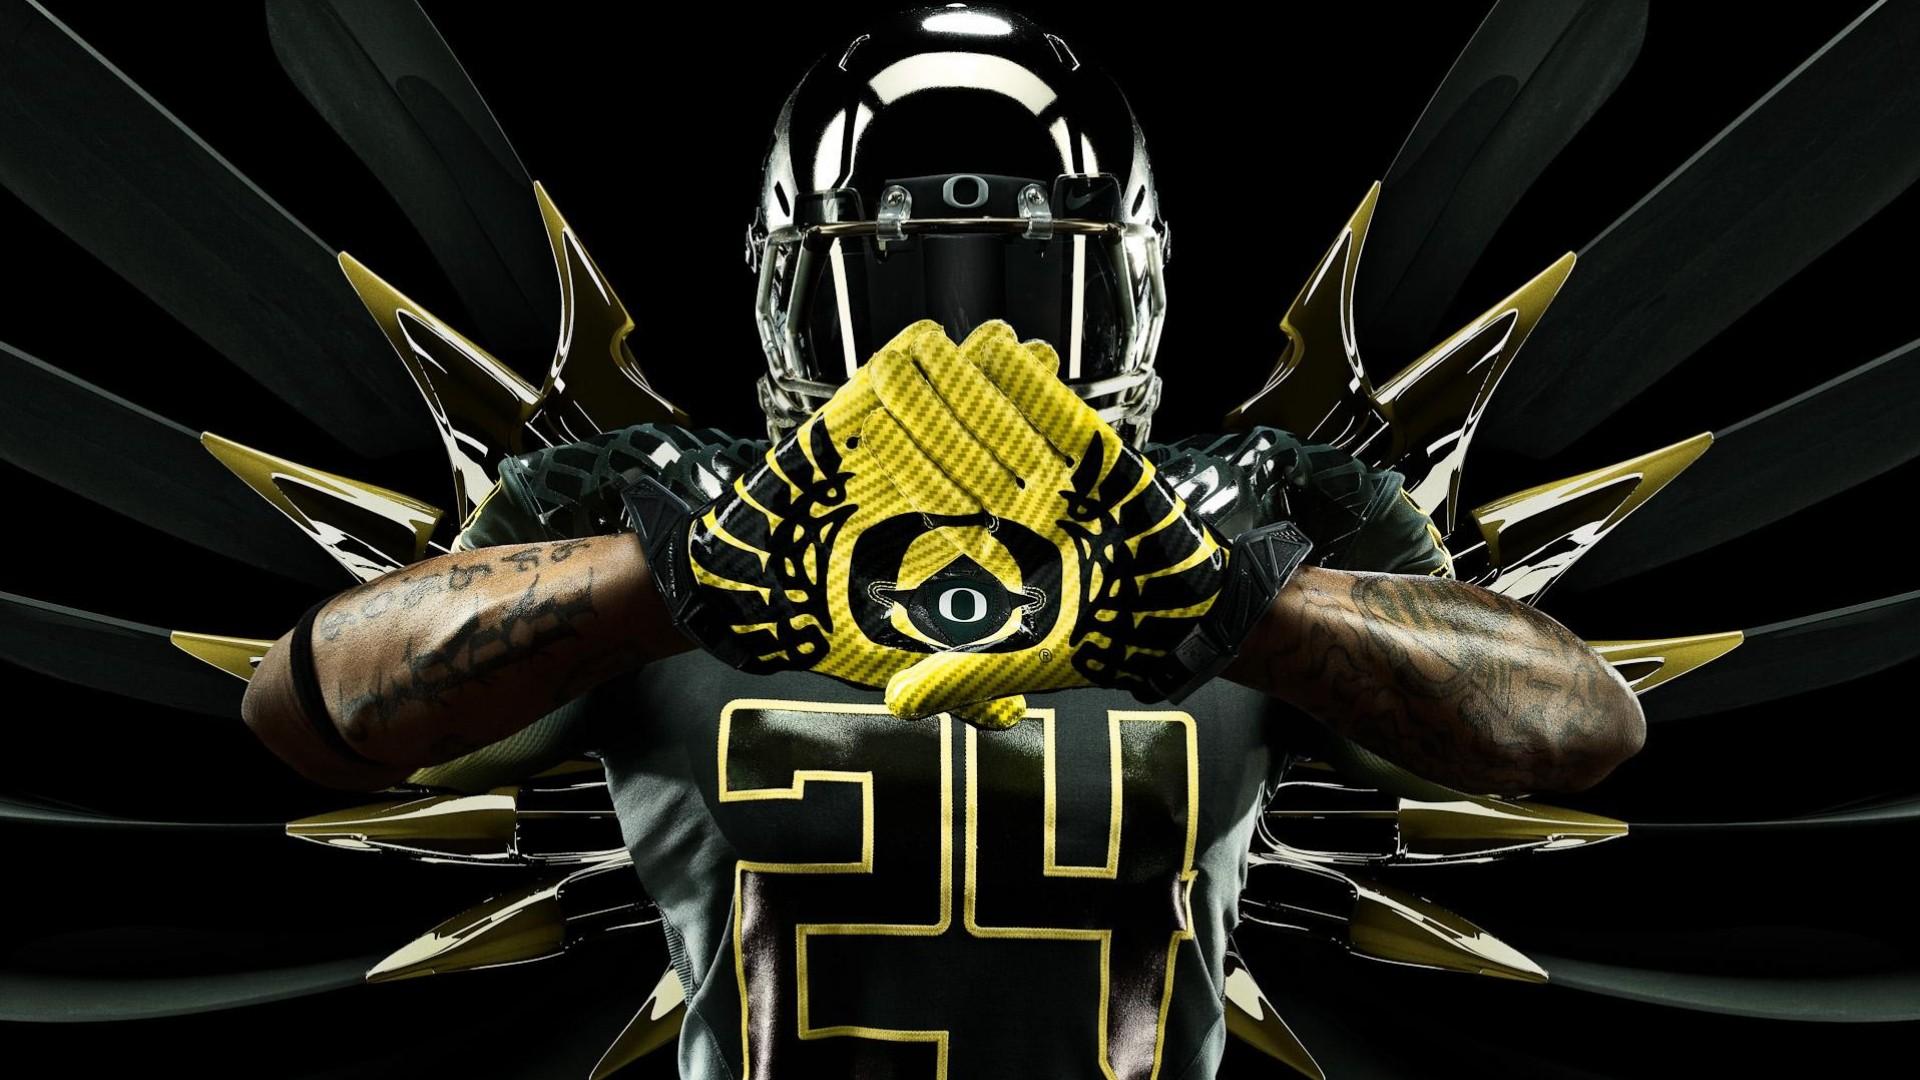 Oregon Football Wallpaper Hd Oregon Ducks Wallpapers Hd Free Download Pixelstalk Net